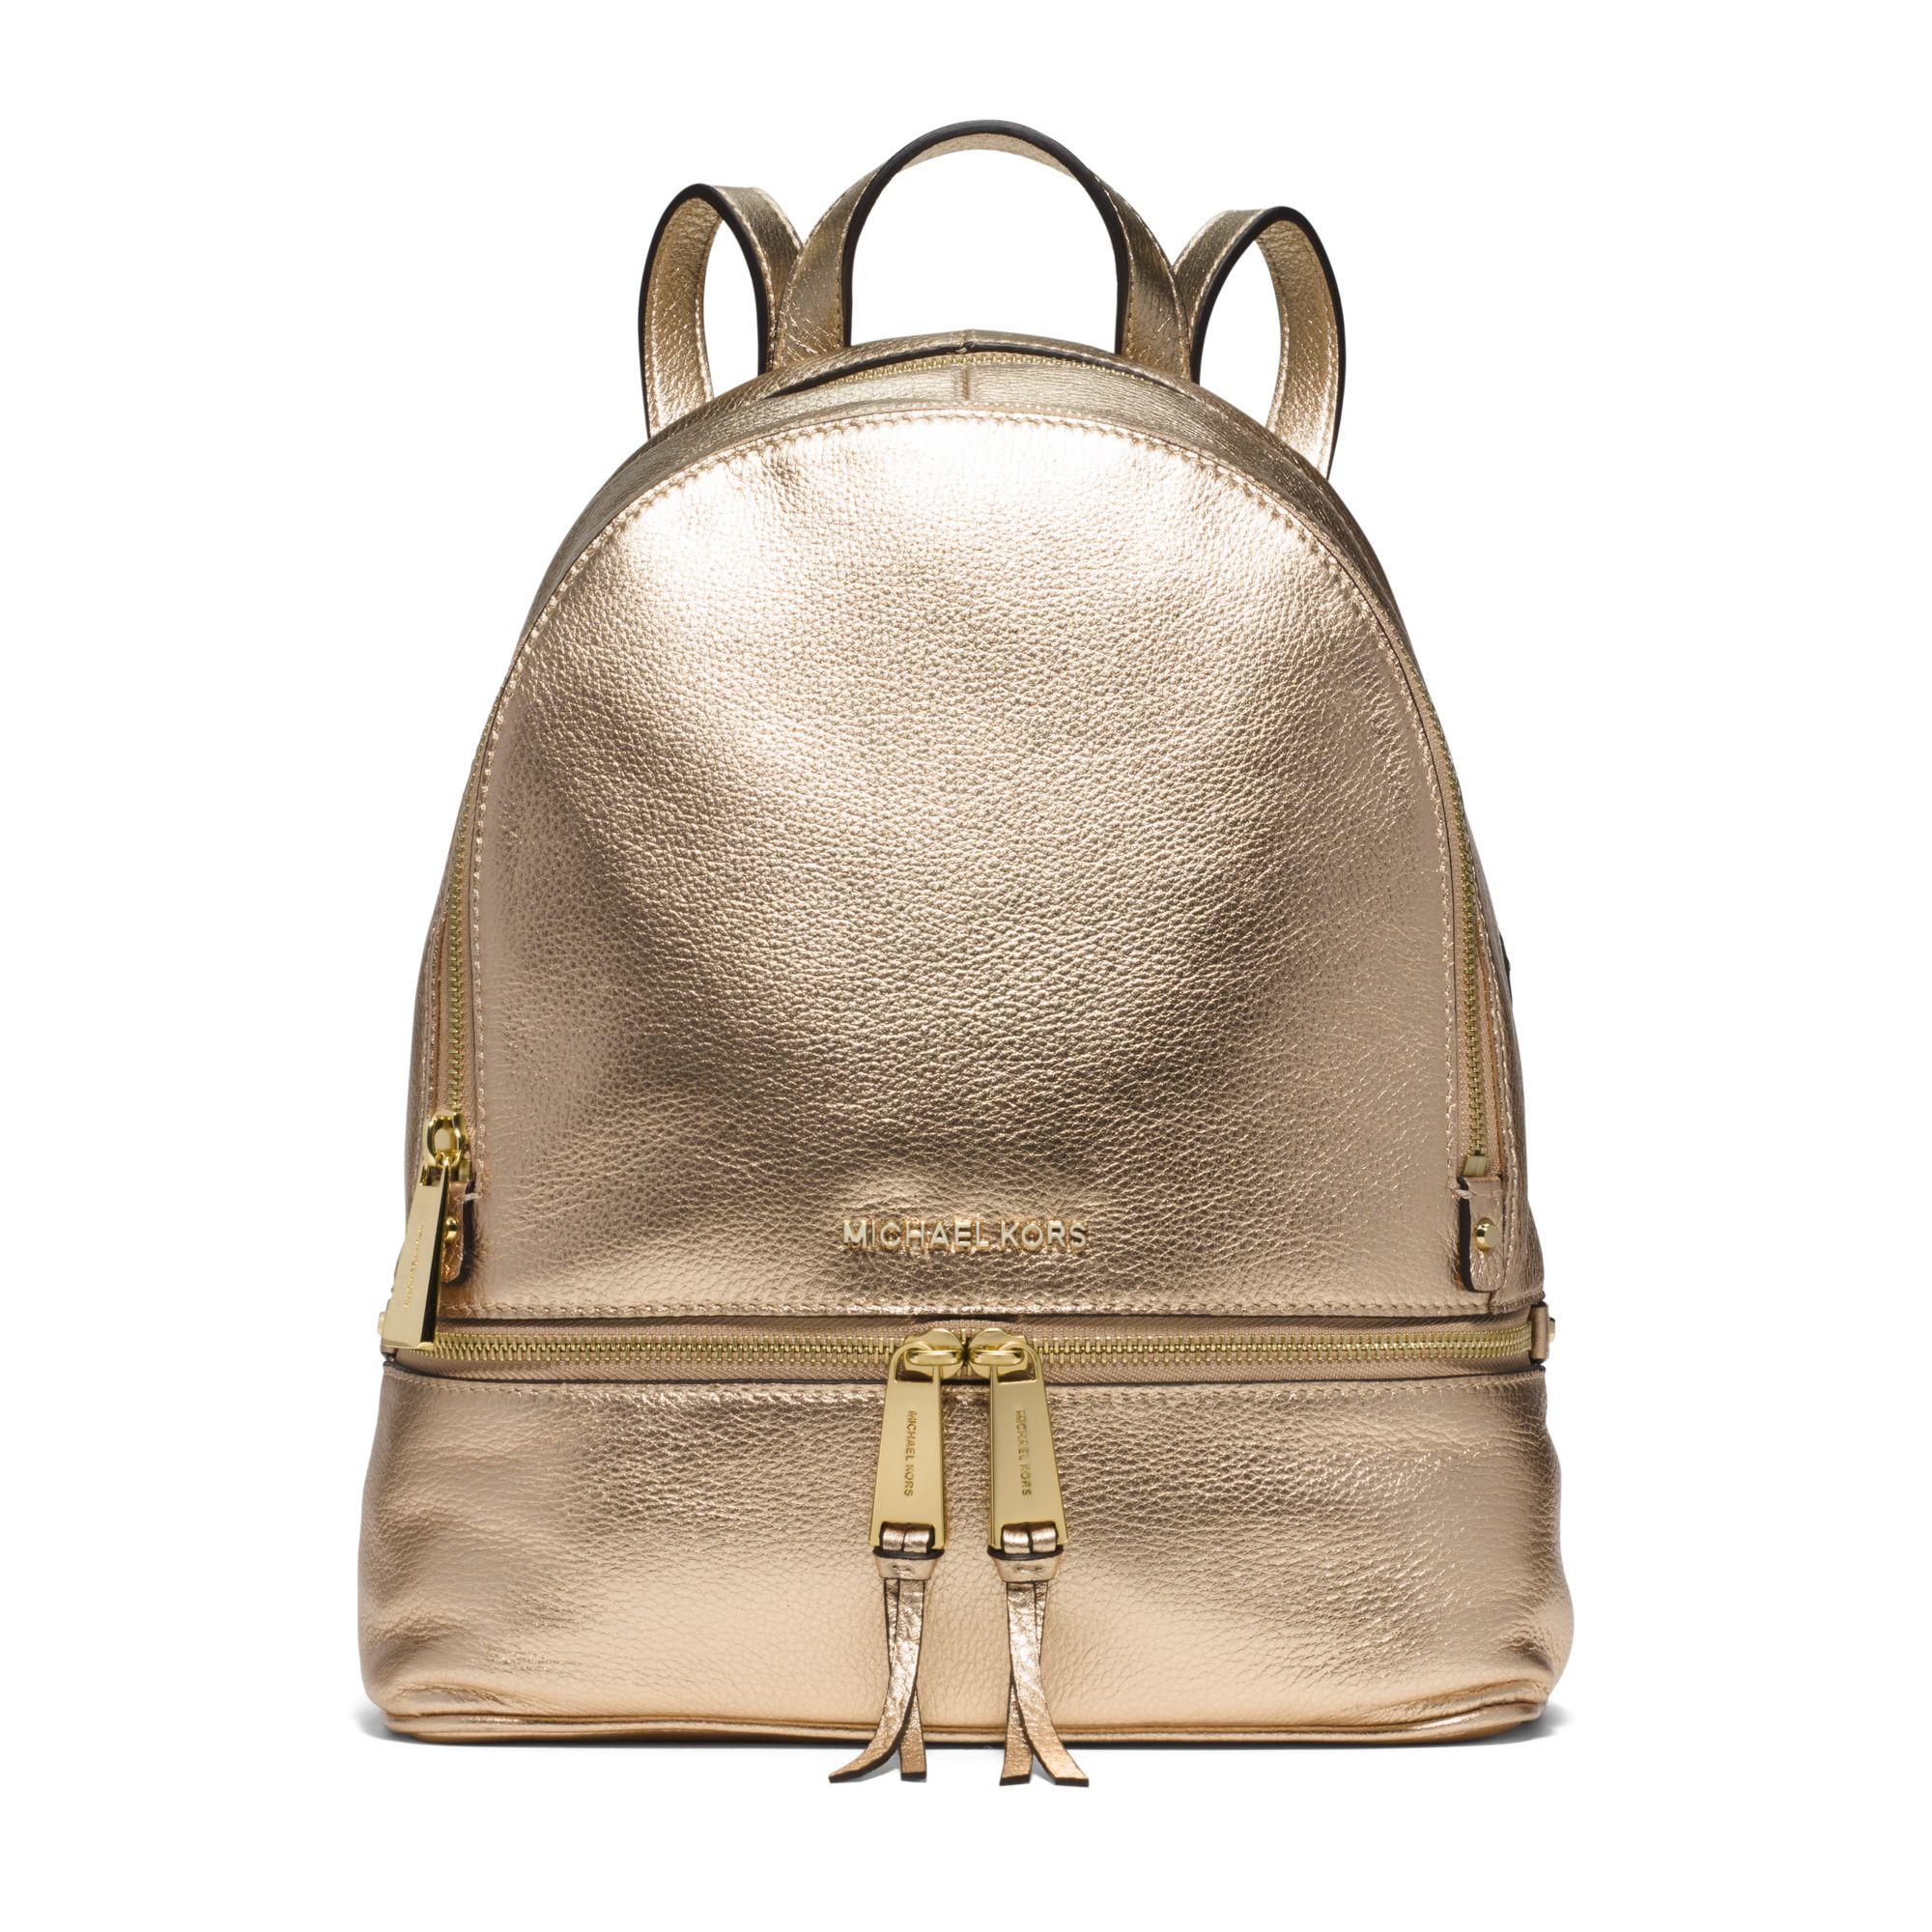 00ddf01ce091 Lyst - Michael Kors Rhea Medium Metallic-leather Backpack in Metallic